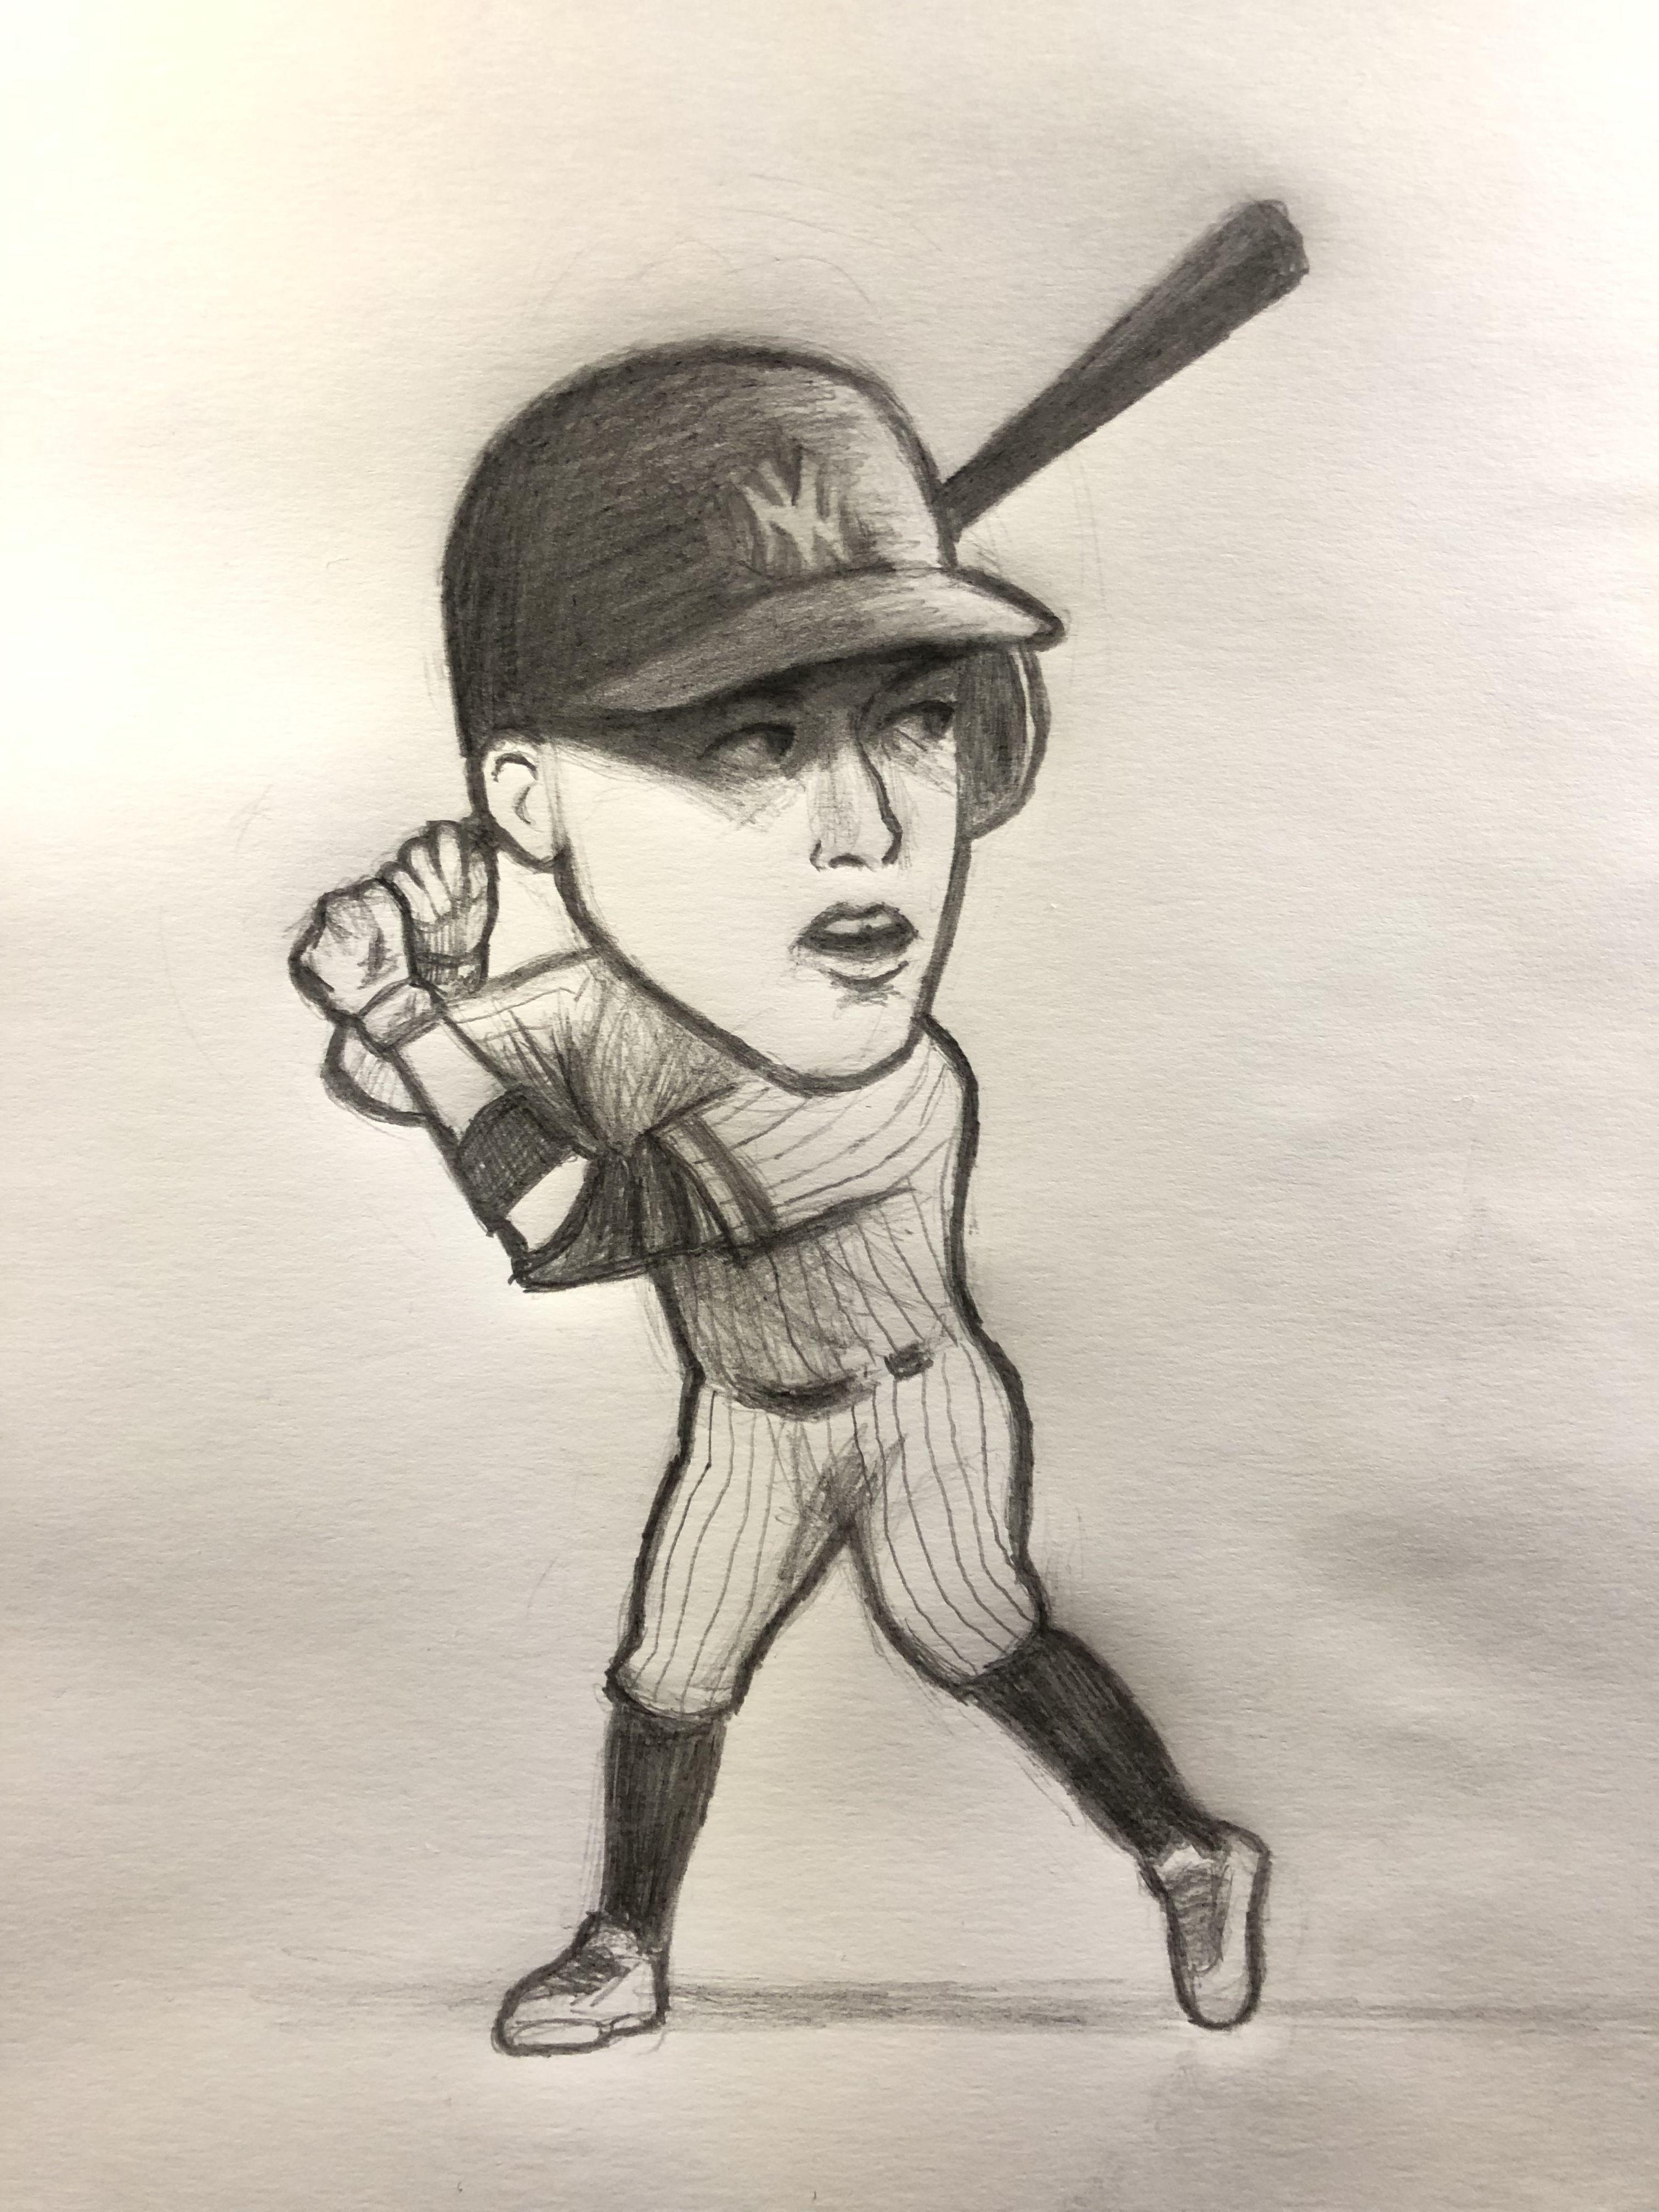 Yankee Doodle Baseball Drawings Cartoon Drawings Sketches